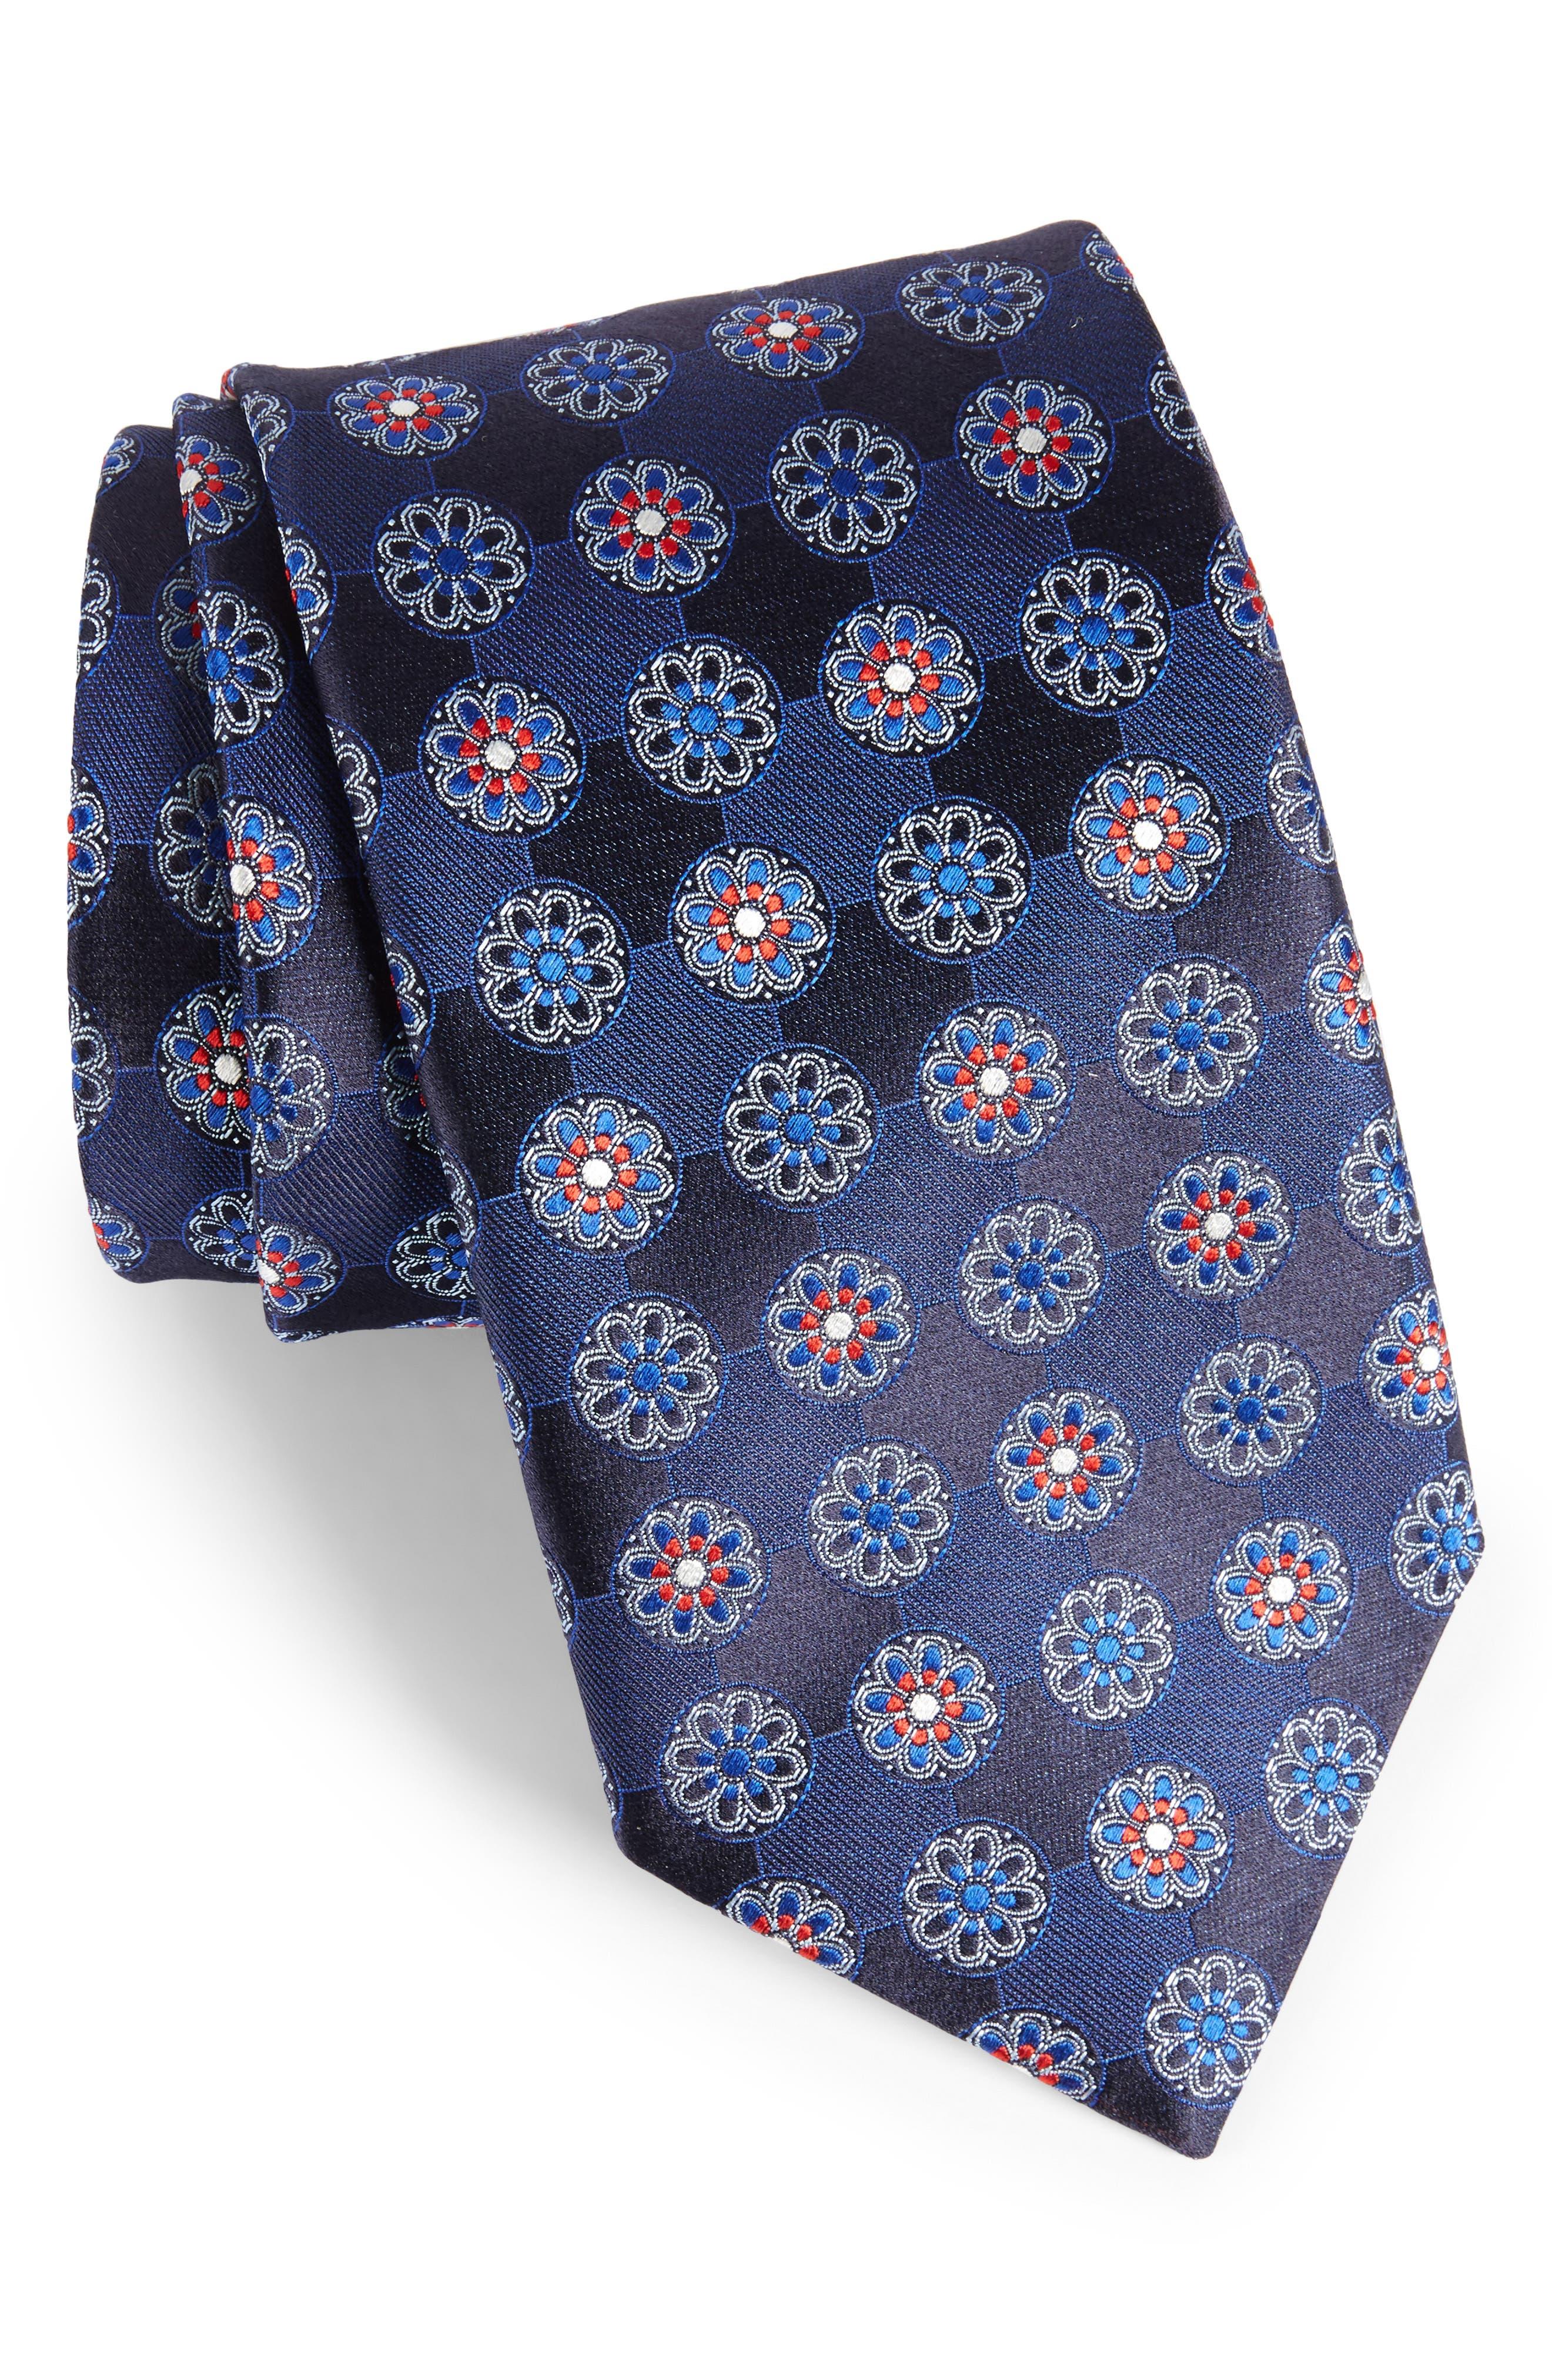 Main Image - Canali Medallion Silk Tie (X-Long)